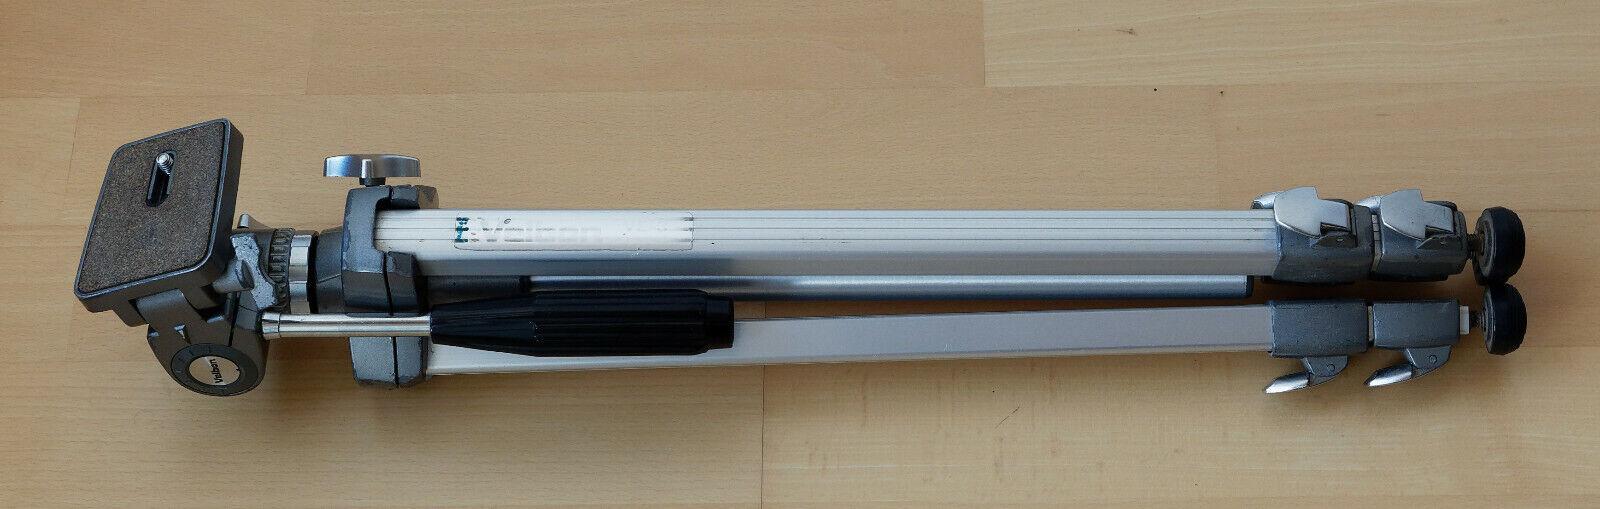 Velbron Dreibeinstativ VE-3, 146cm